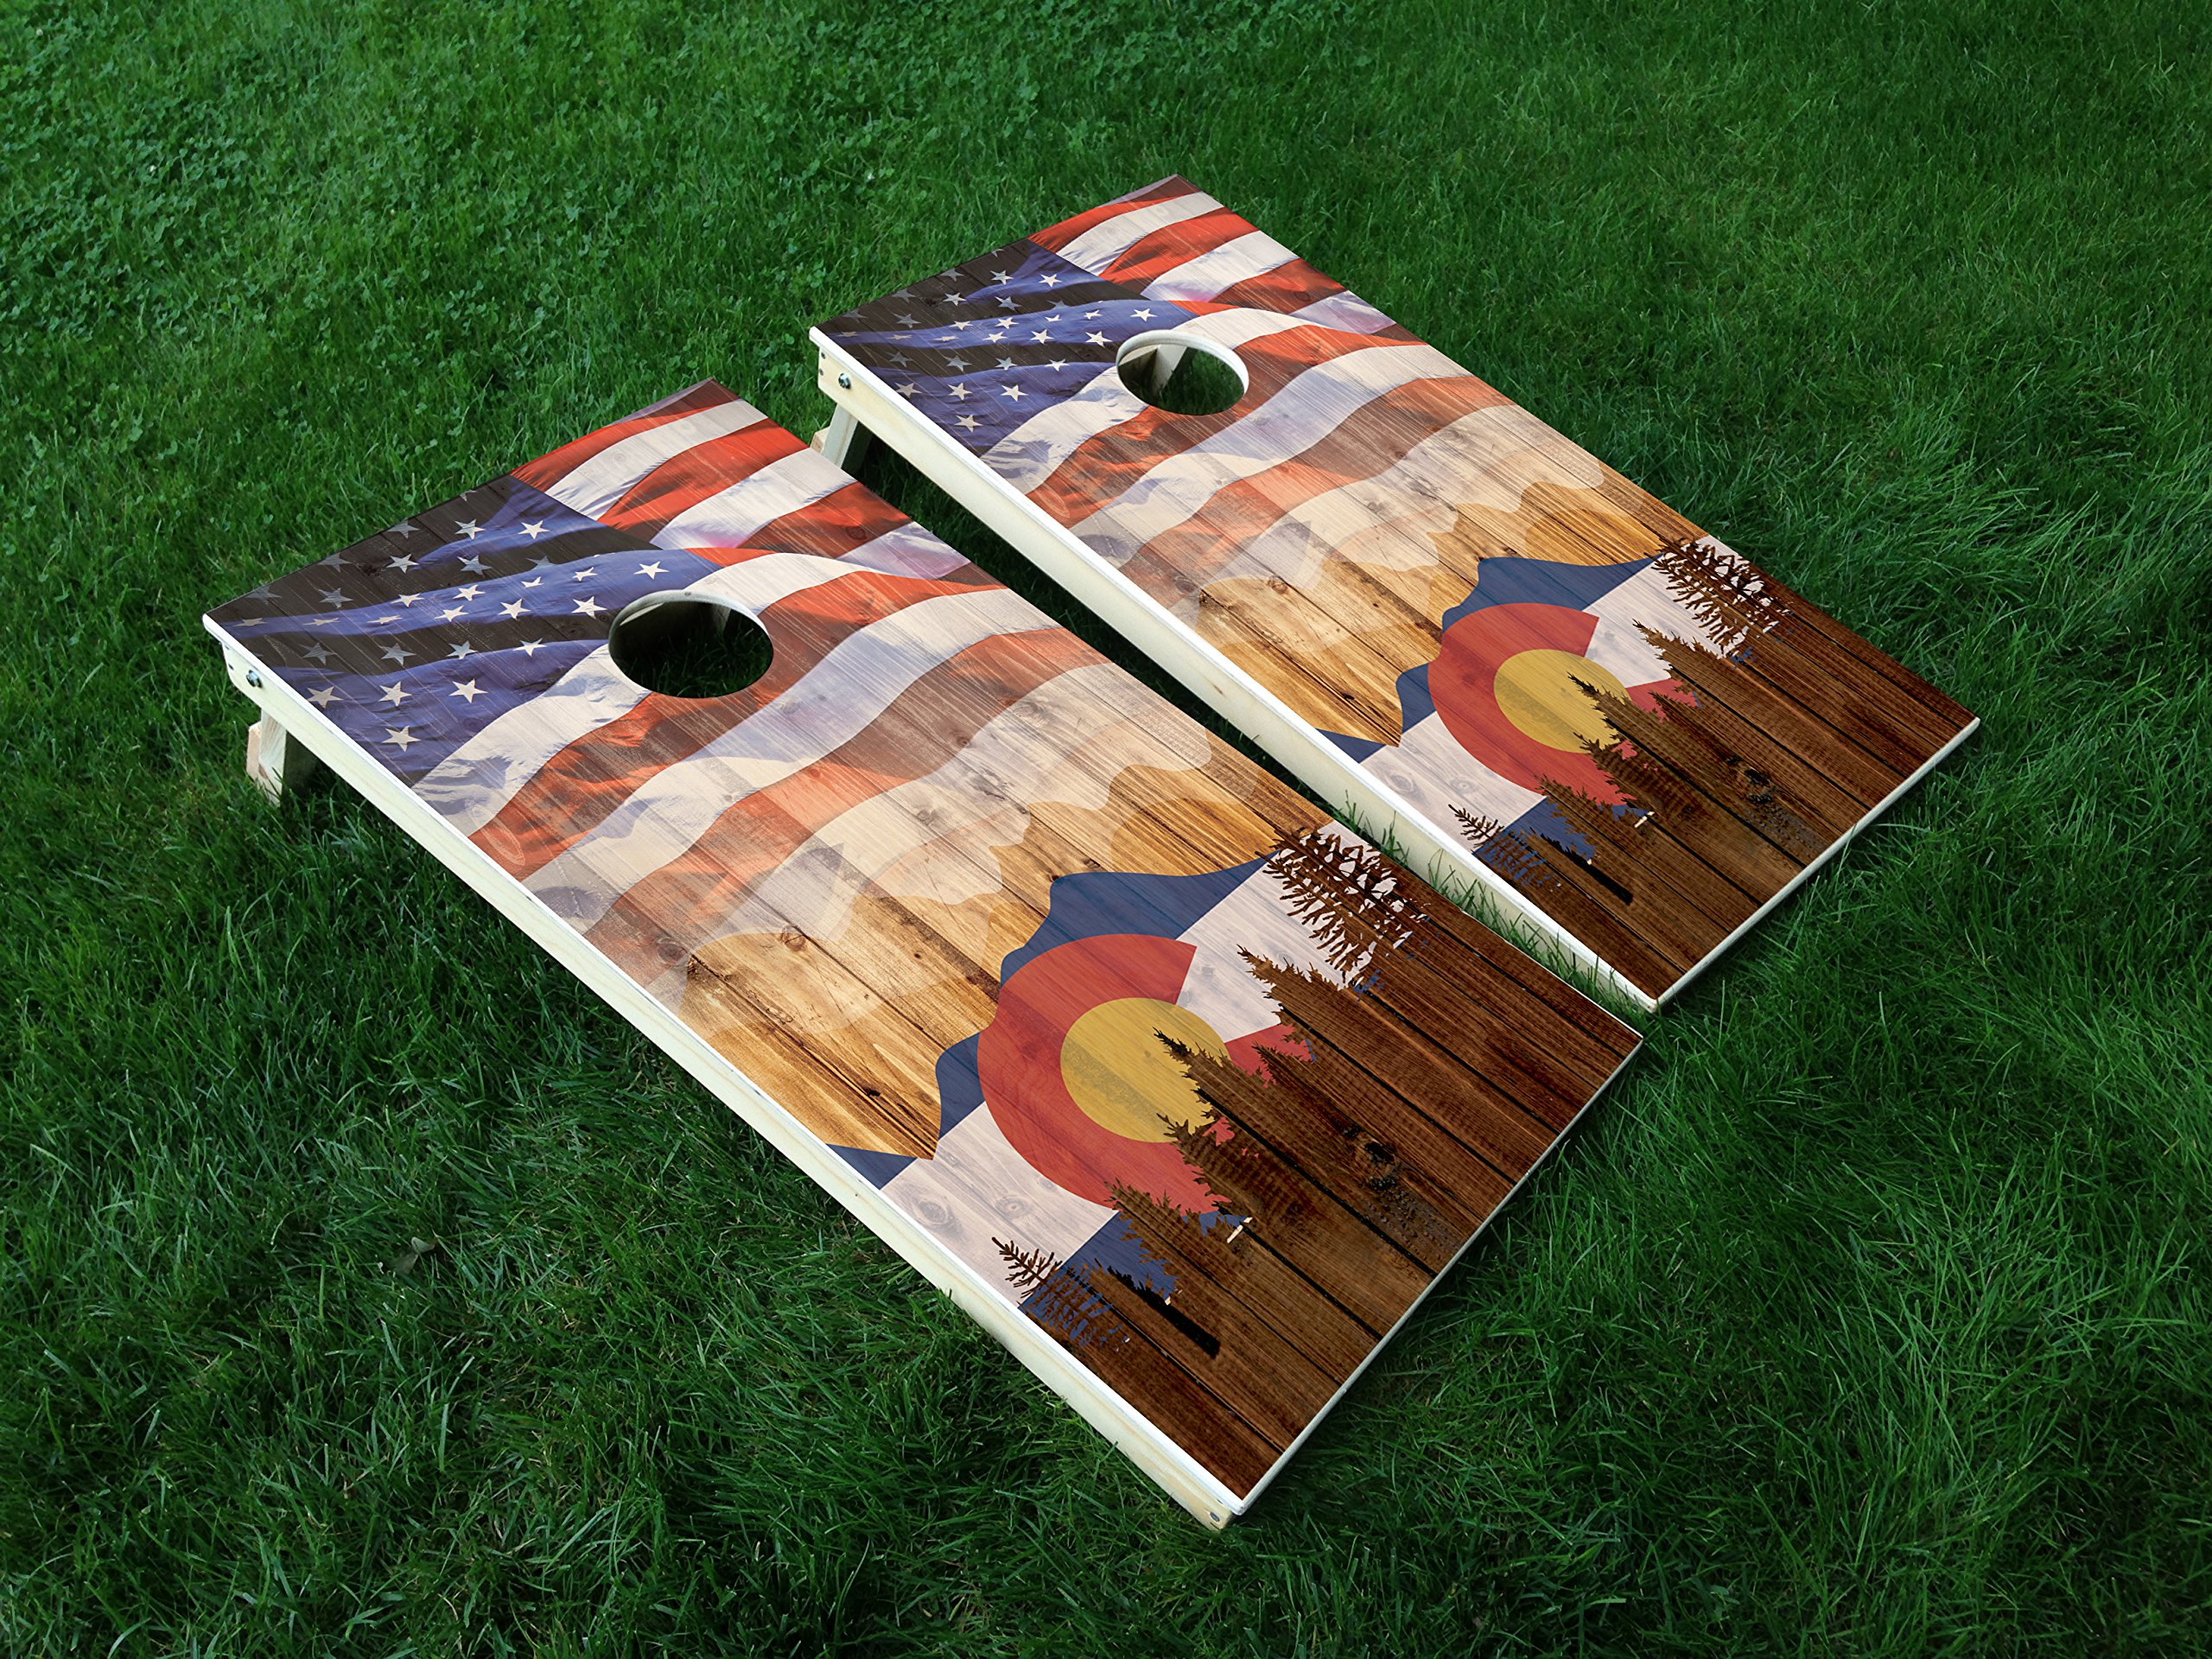 DISTRESSED Colorado 15 Colorado State FLAG CORNHOLE WRAP SET Vinyl Board DECAL Baggo Bag Toss Boards MADE IN the USA